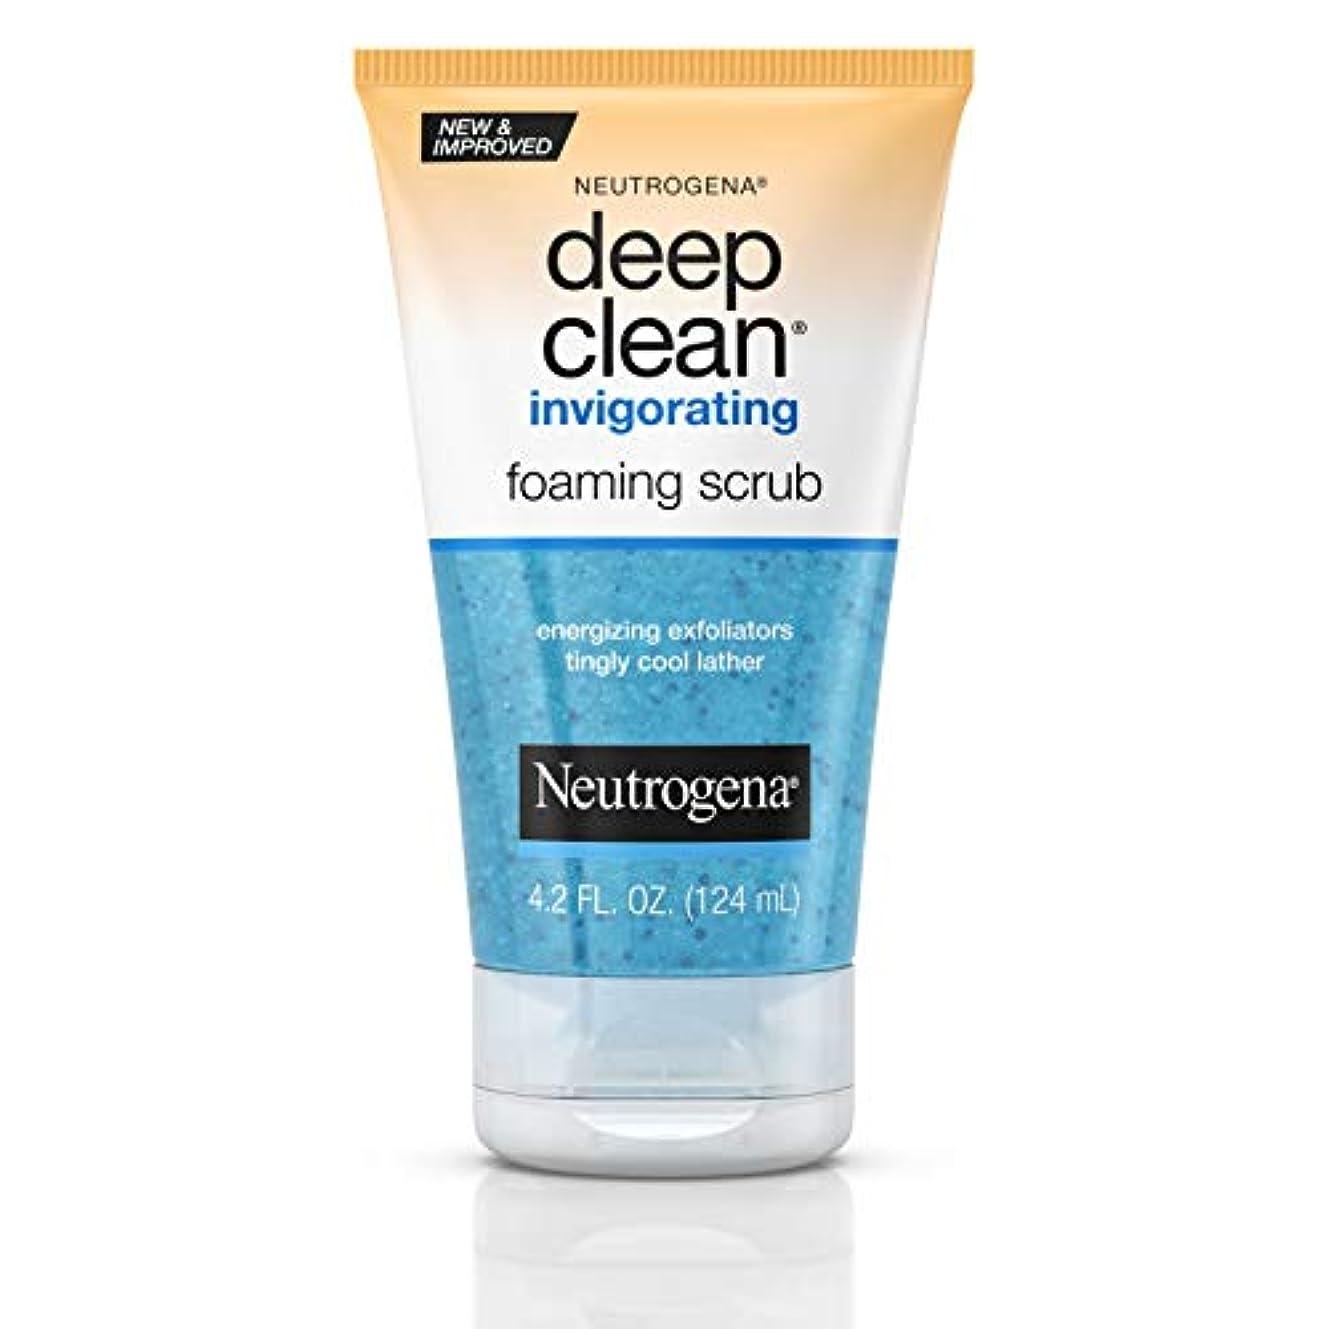 Neutrogena Deep Clean Invigorating Foaming Scrub ニキビのための皮膚の奥までキレイにする洗顔ジェル125ml